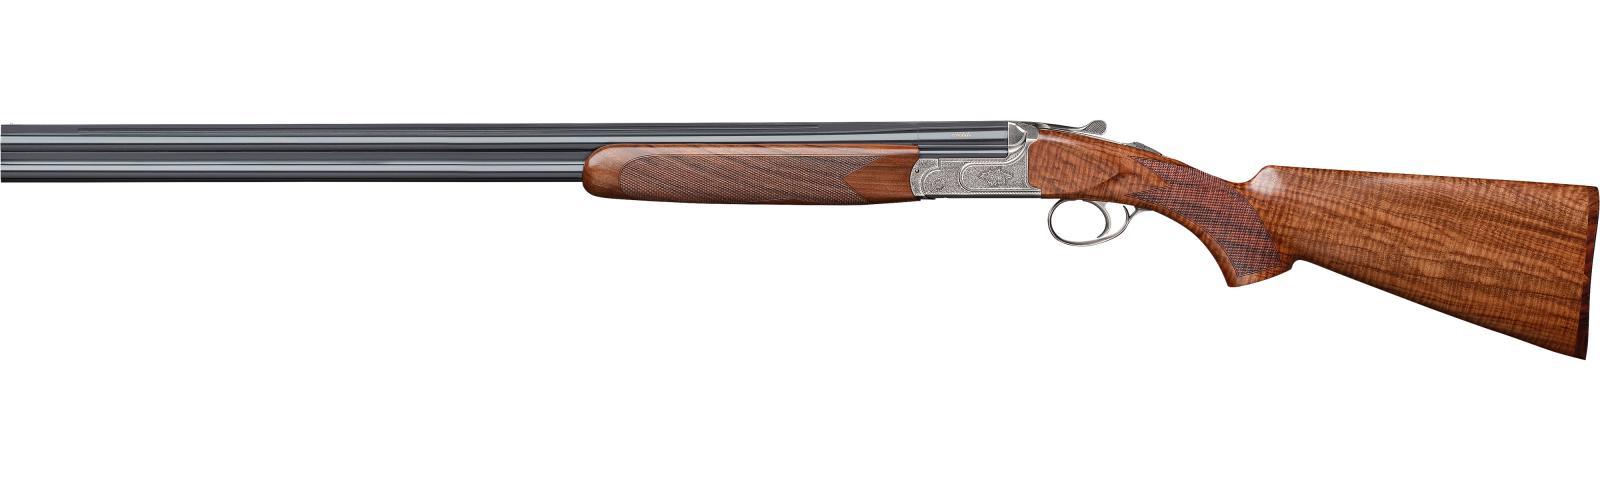 Fusil superposé ZOLI Nobile Cal. 12/76